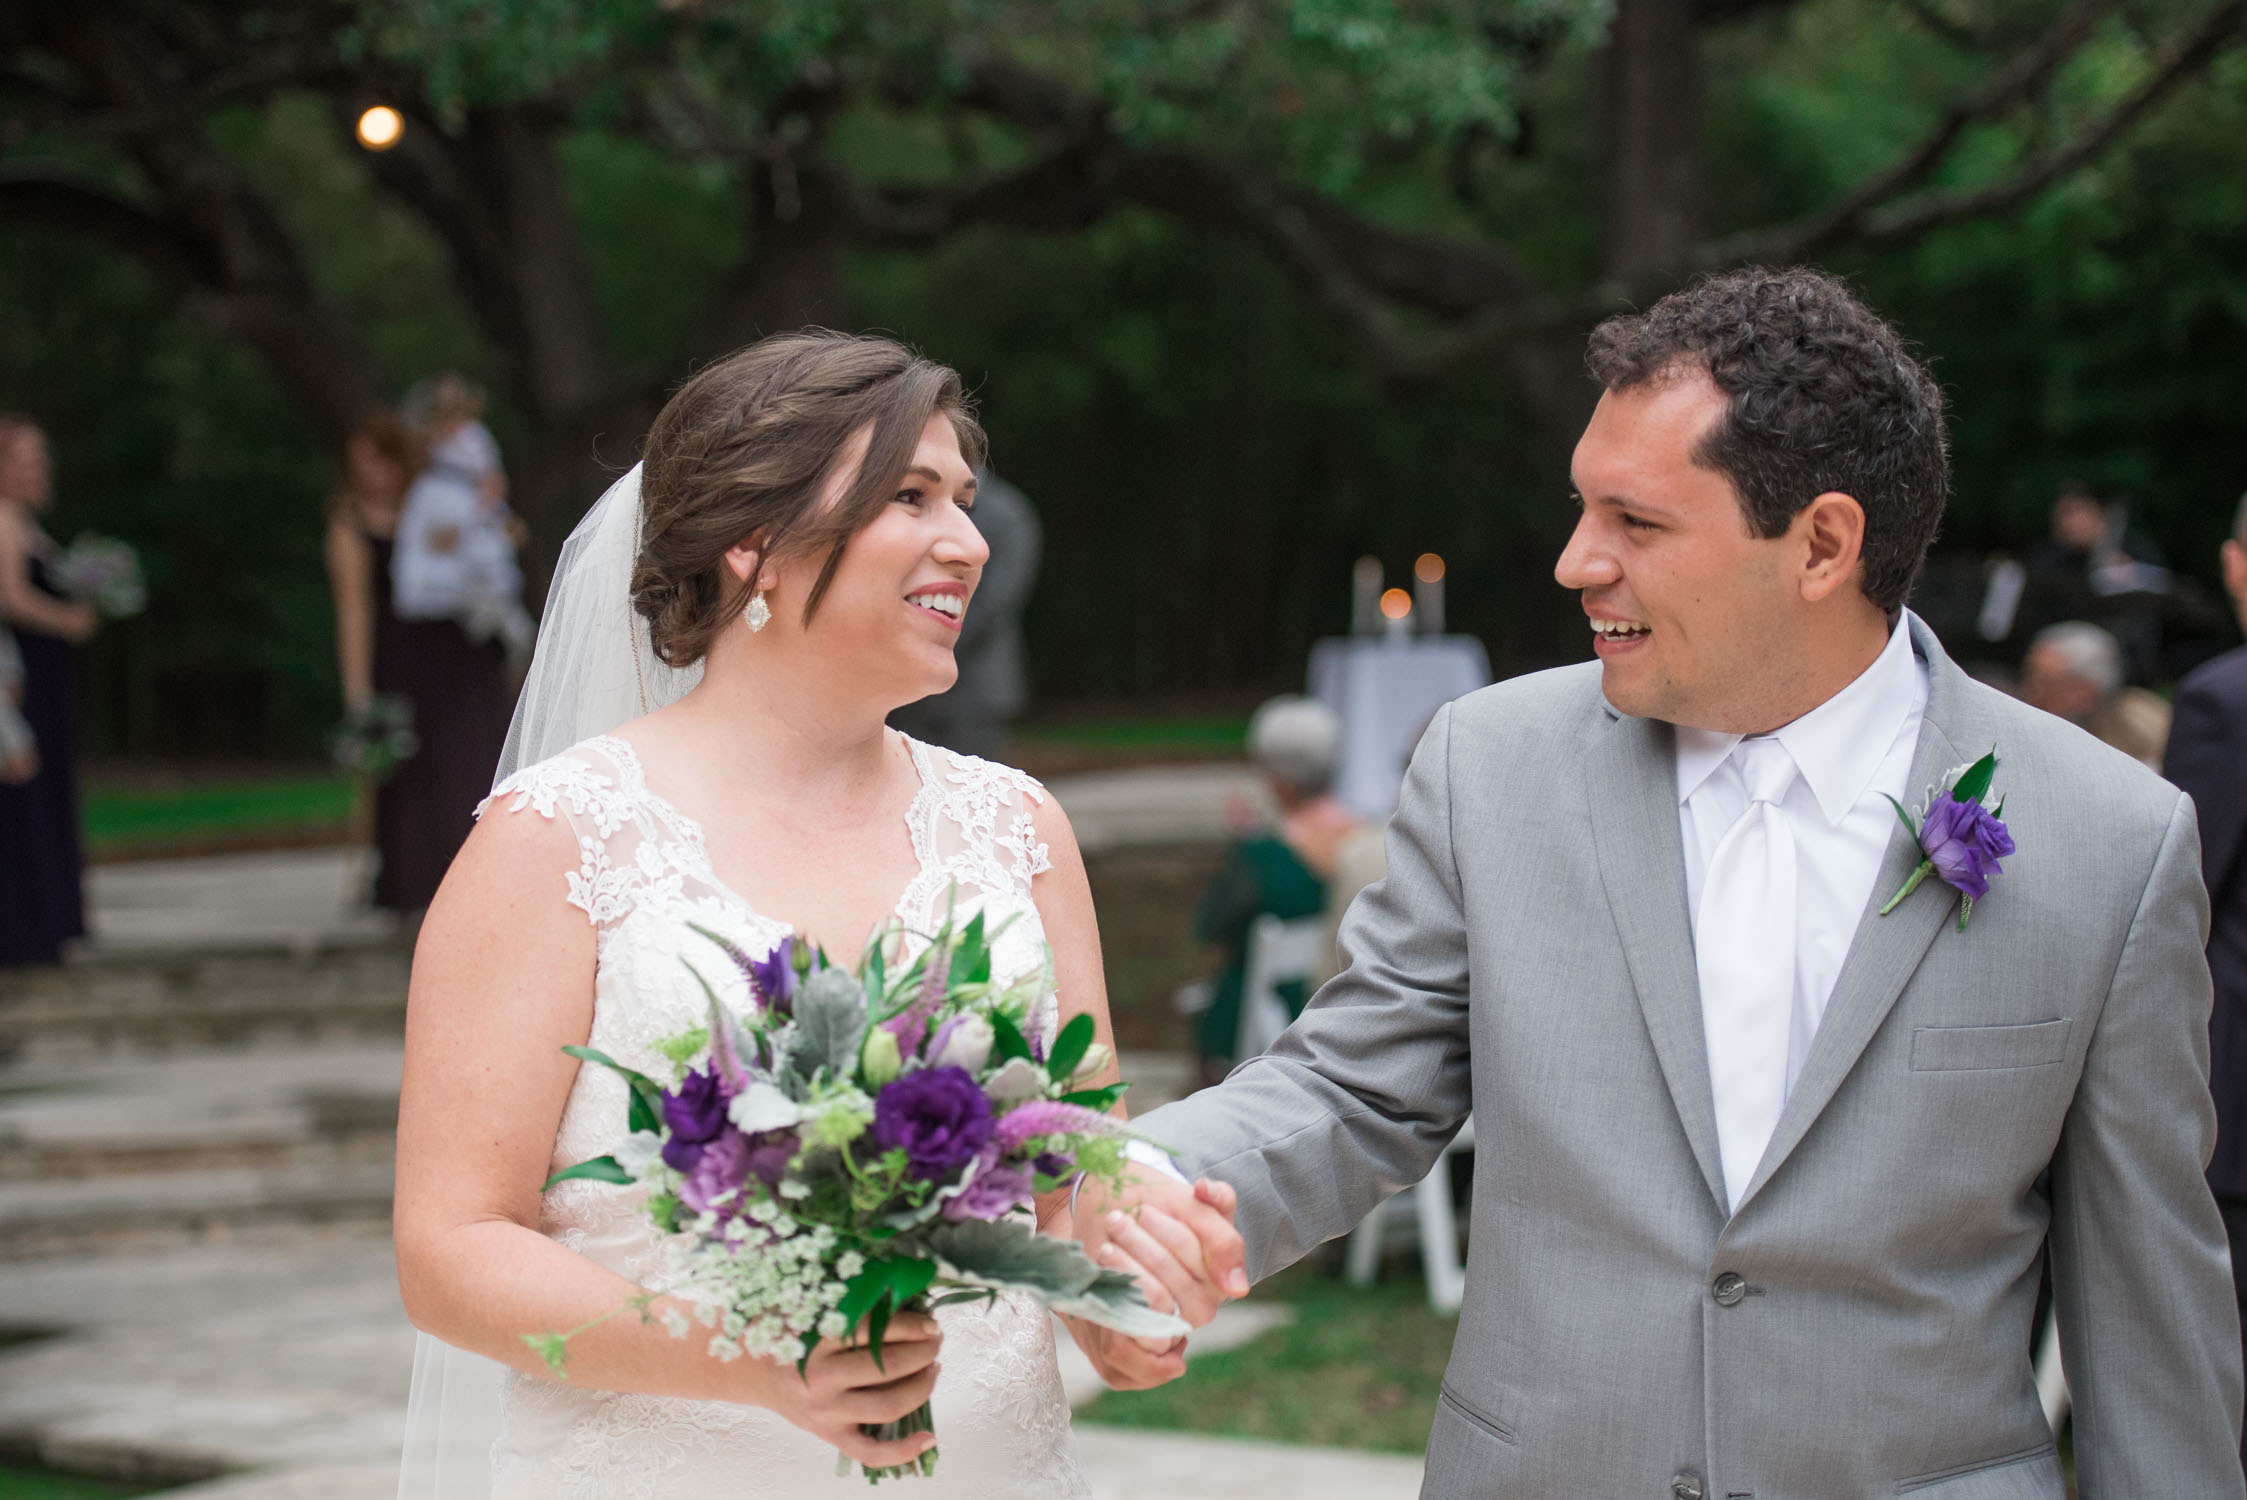 Alex and Austin Wedding Photography at Mercury Hall in Texas-92.jpg